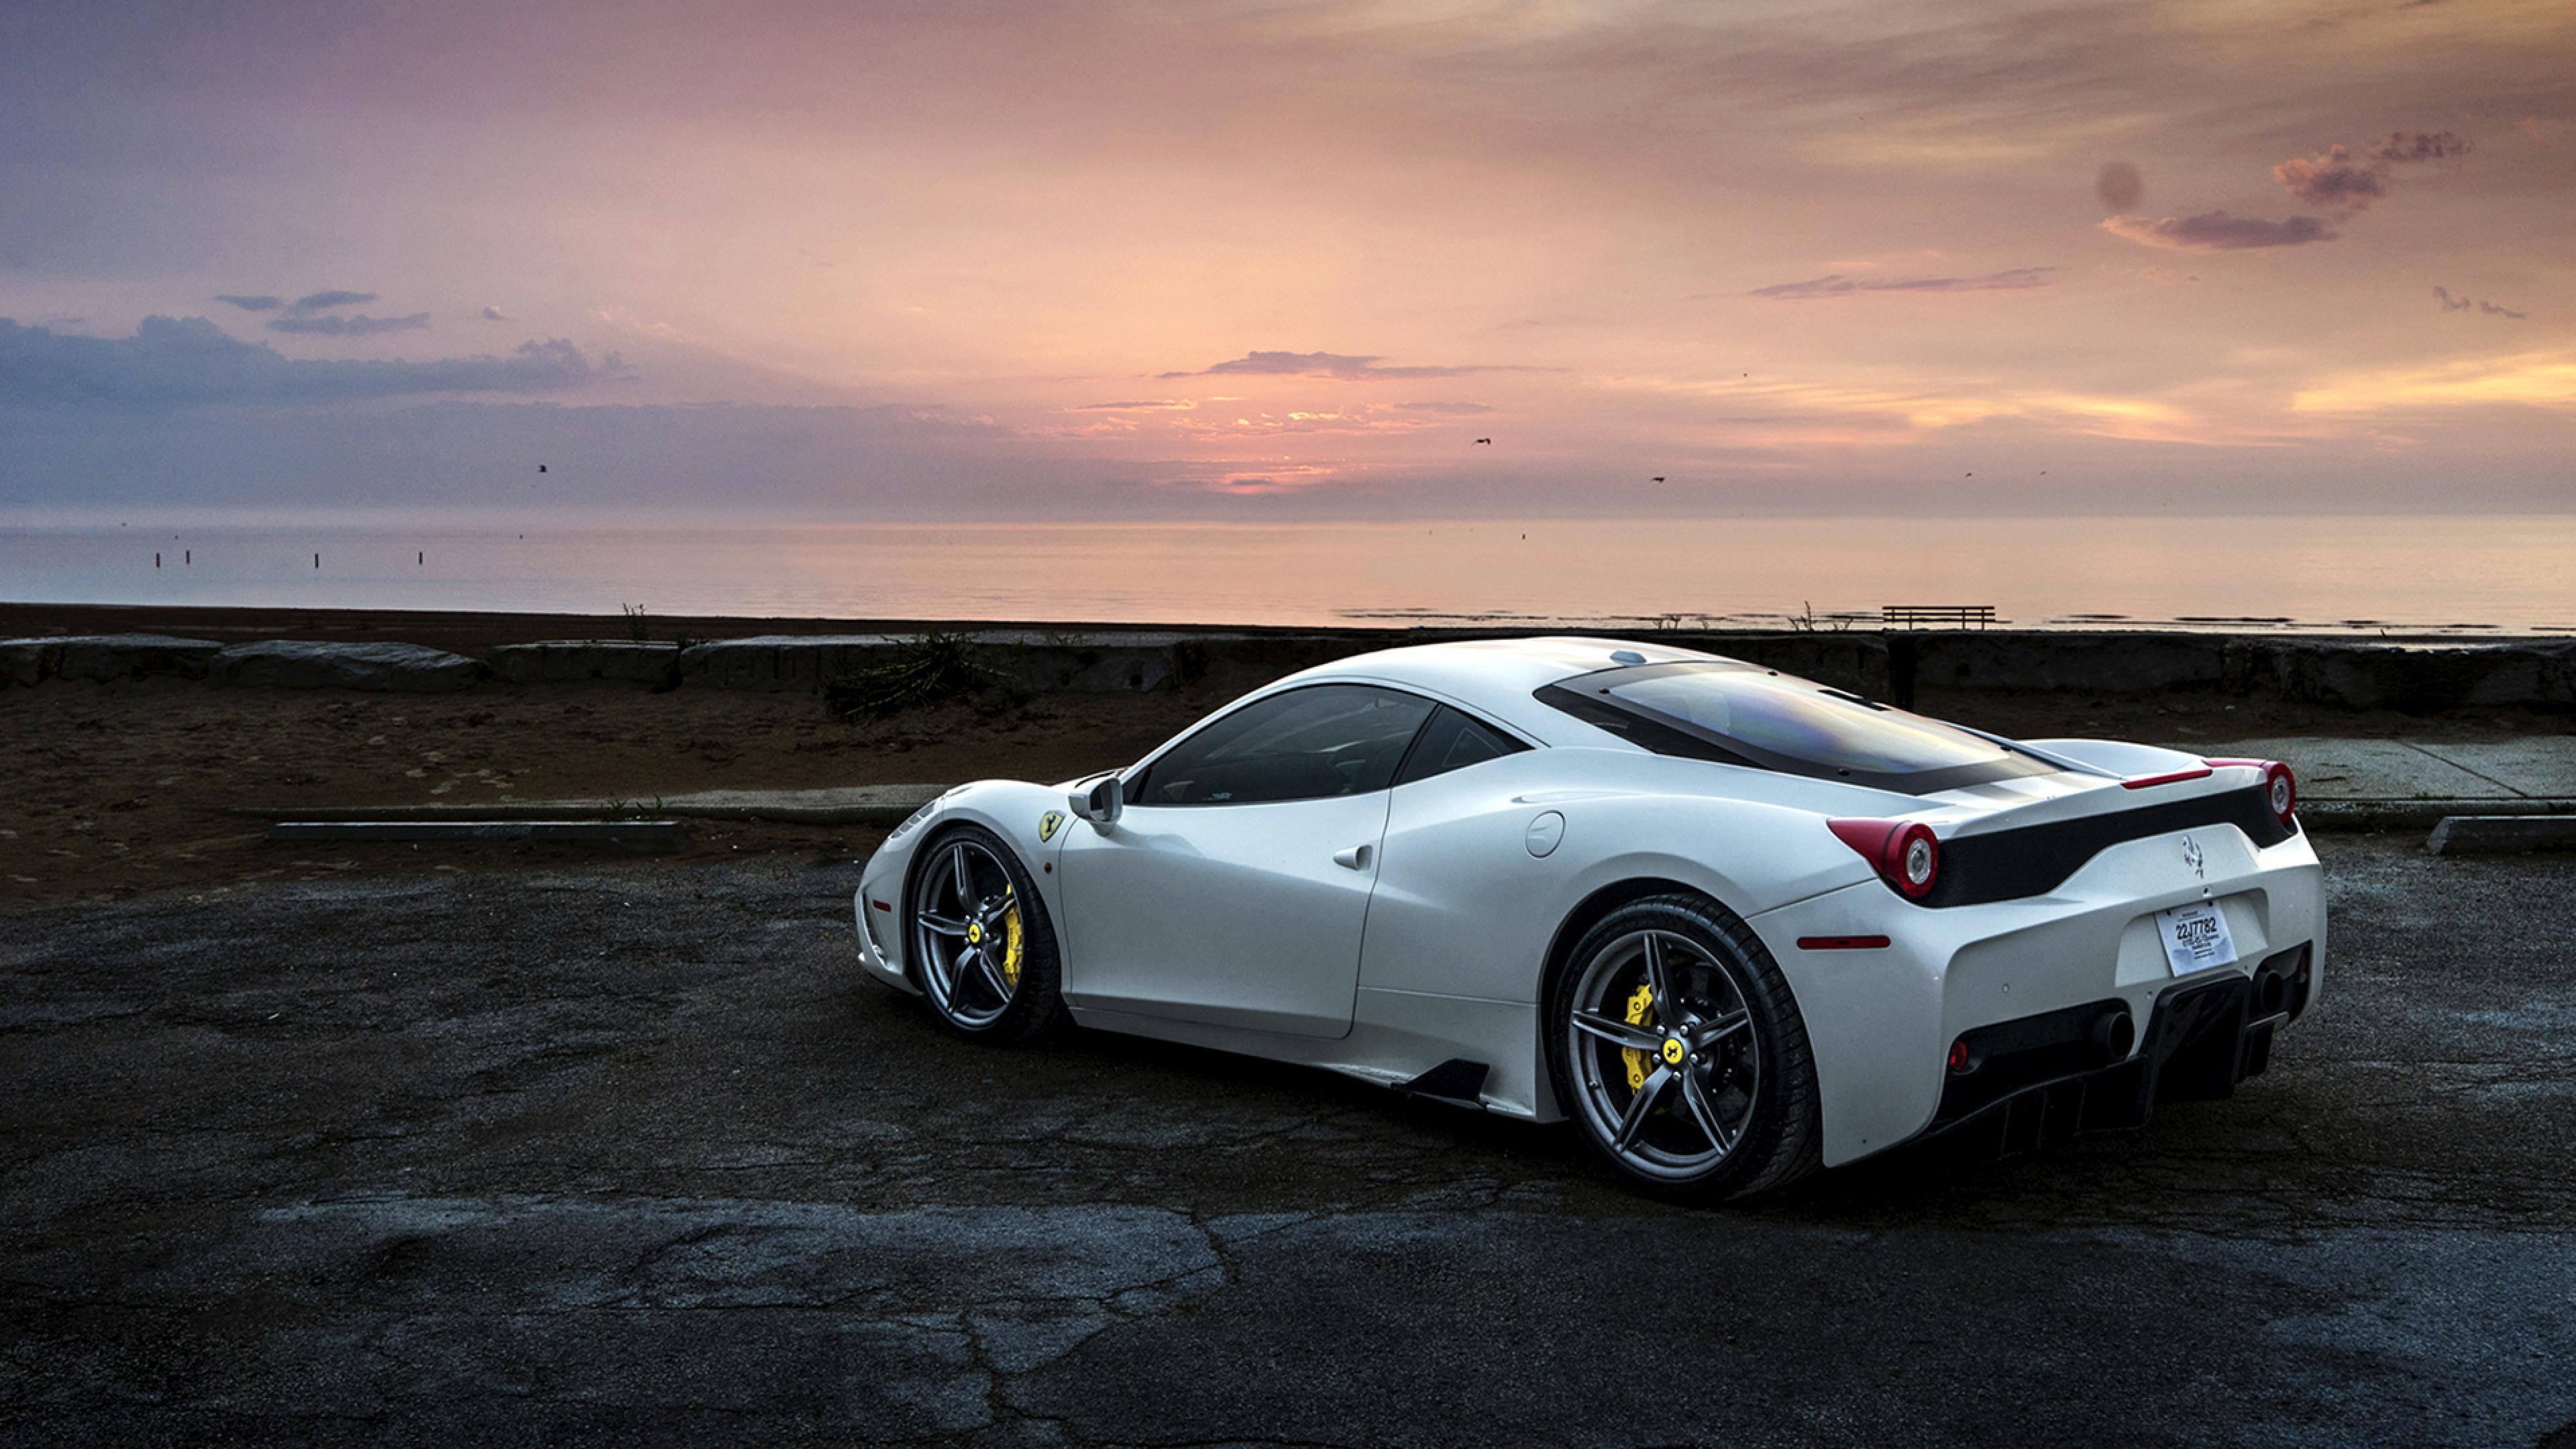 ferrari 458 white 1539104508 - Ferrari 458 White - ferrari wallpapers, ferrari 458 wallpapers, cars wallpapers